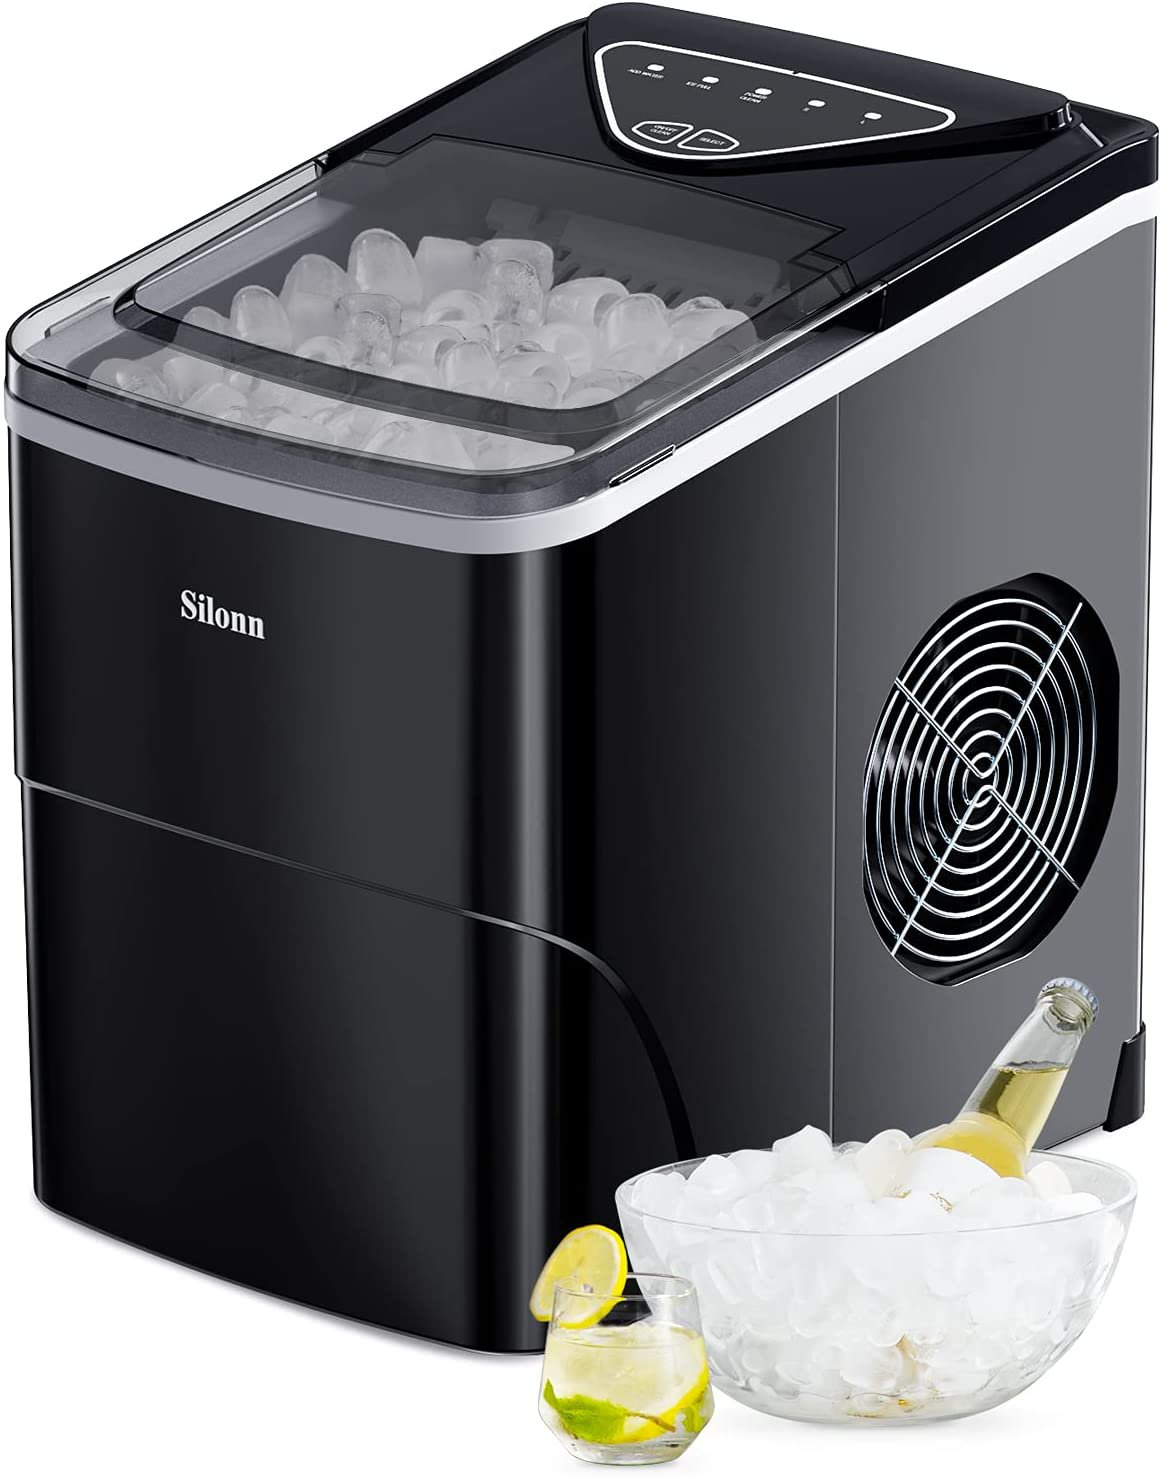 Silonn Ice Makers Countertop Portable Ice Maker Machine